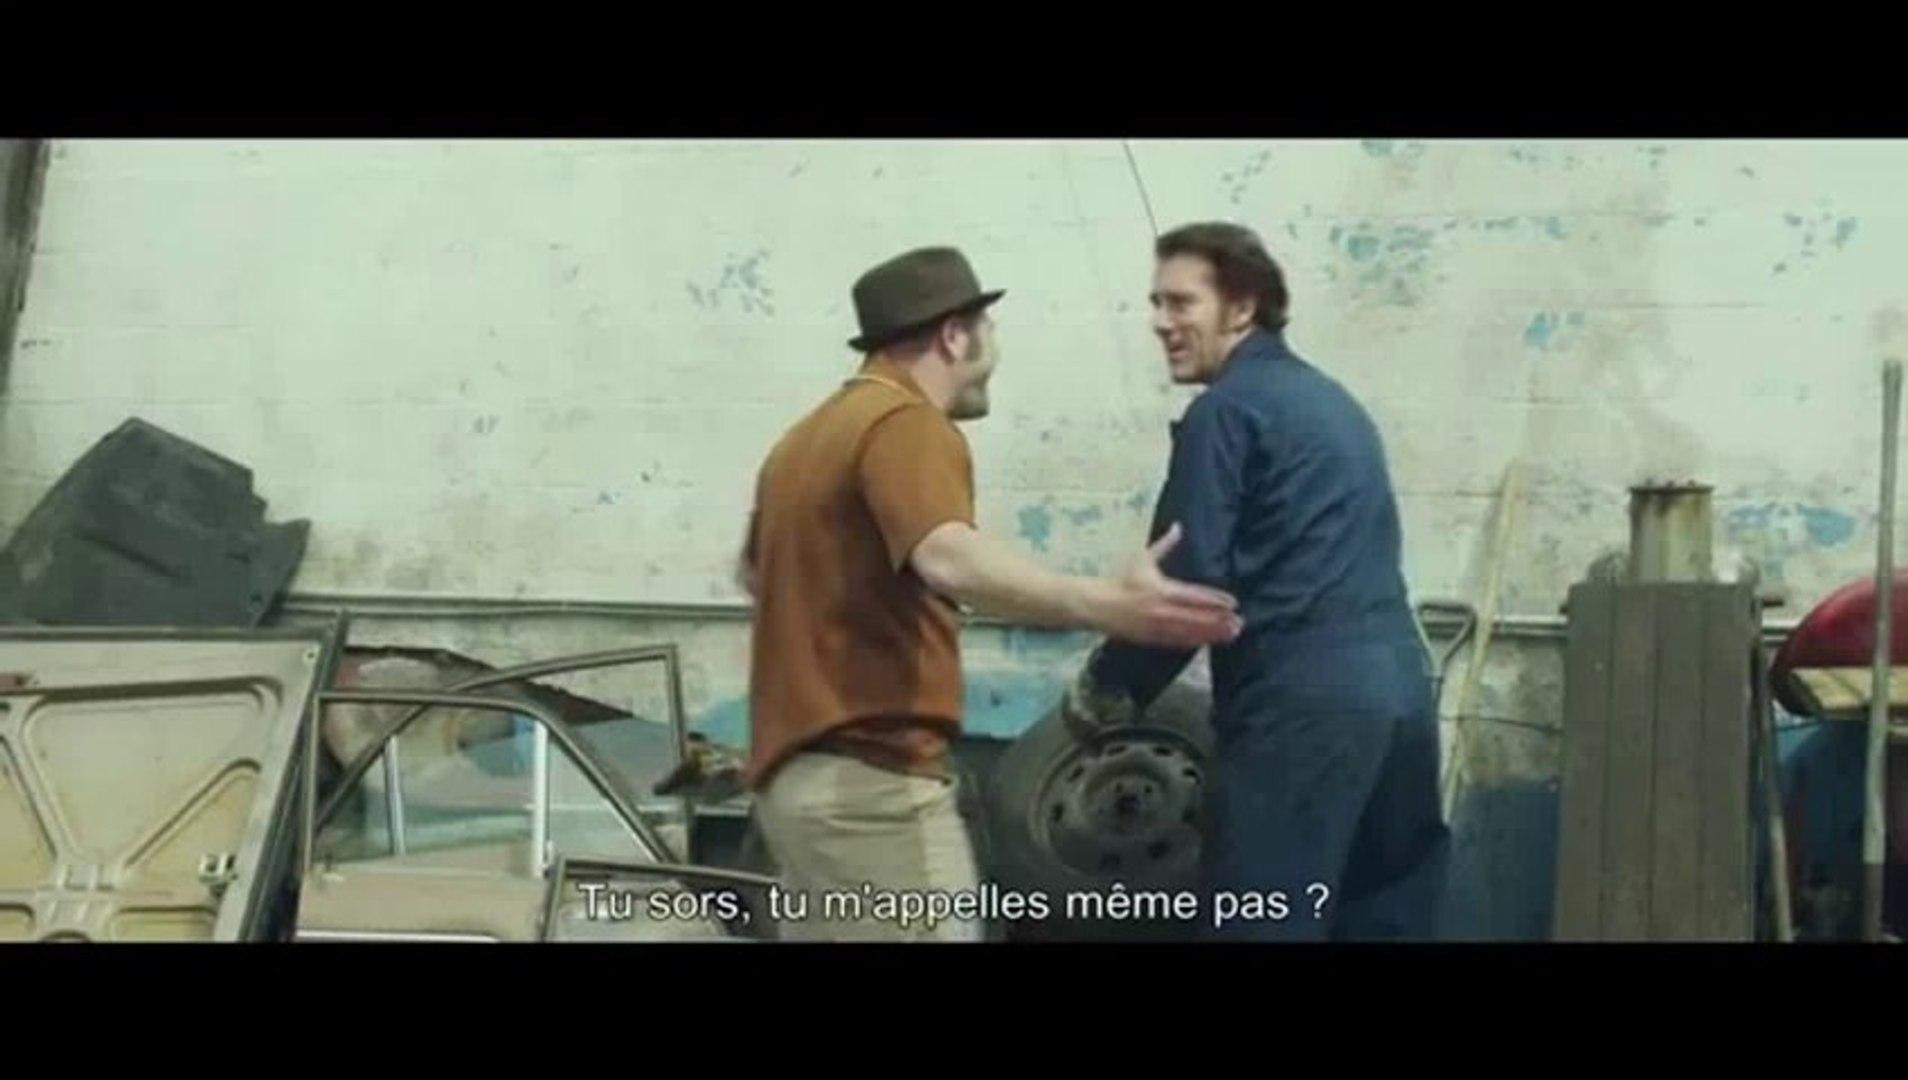 Blood Ties film complet partie 1 streaming VF en Entier en français (HD)